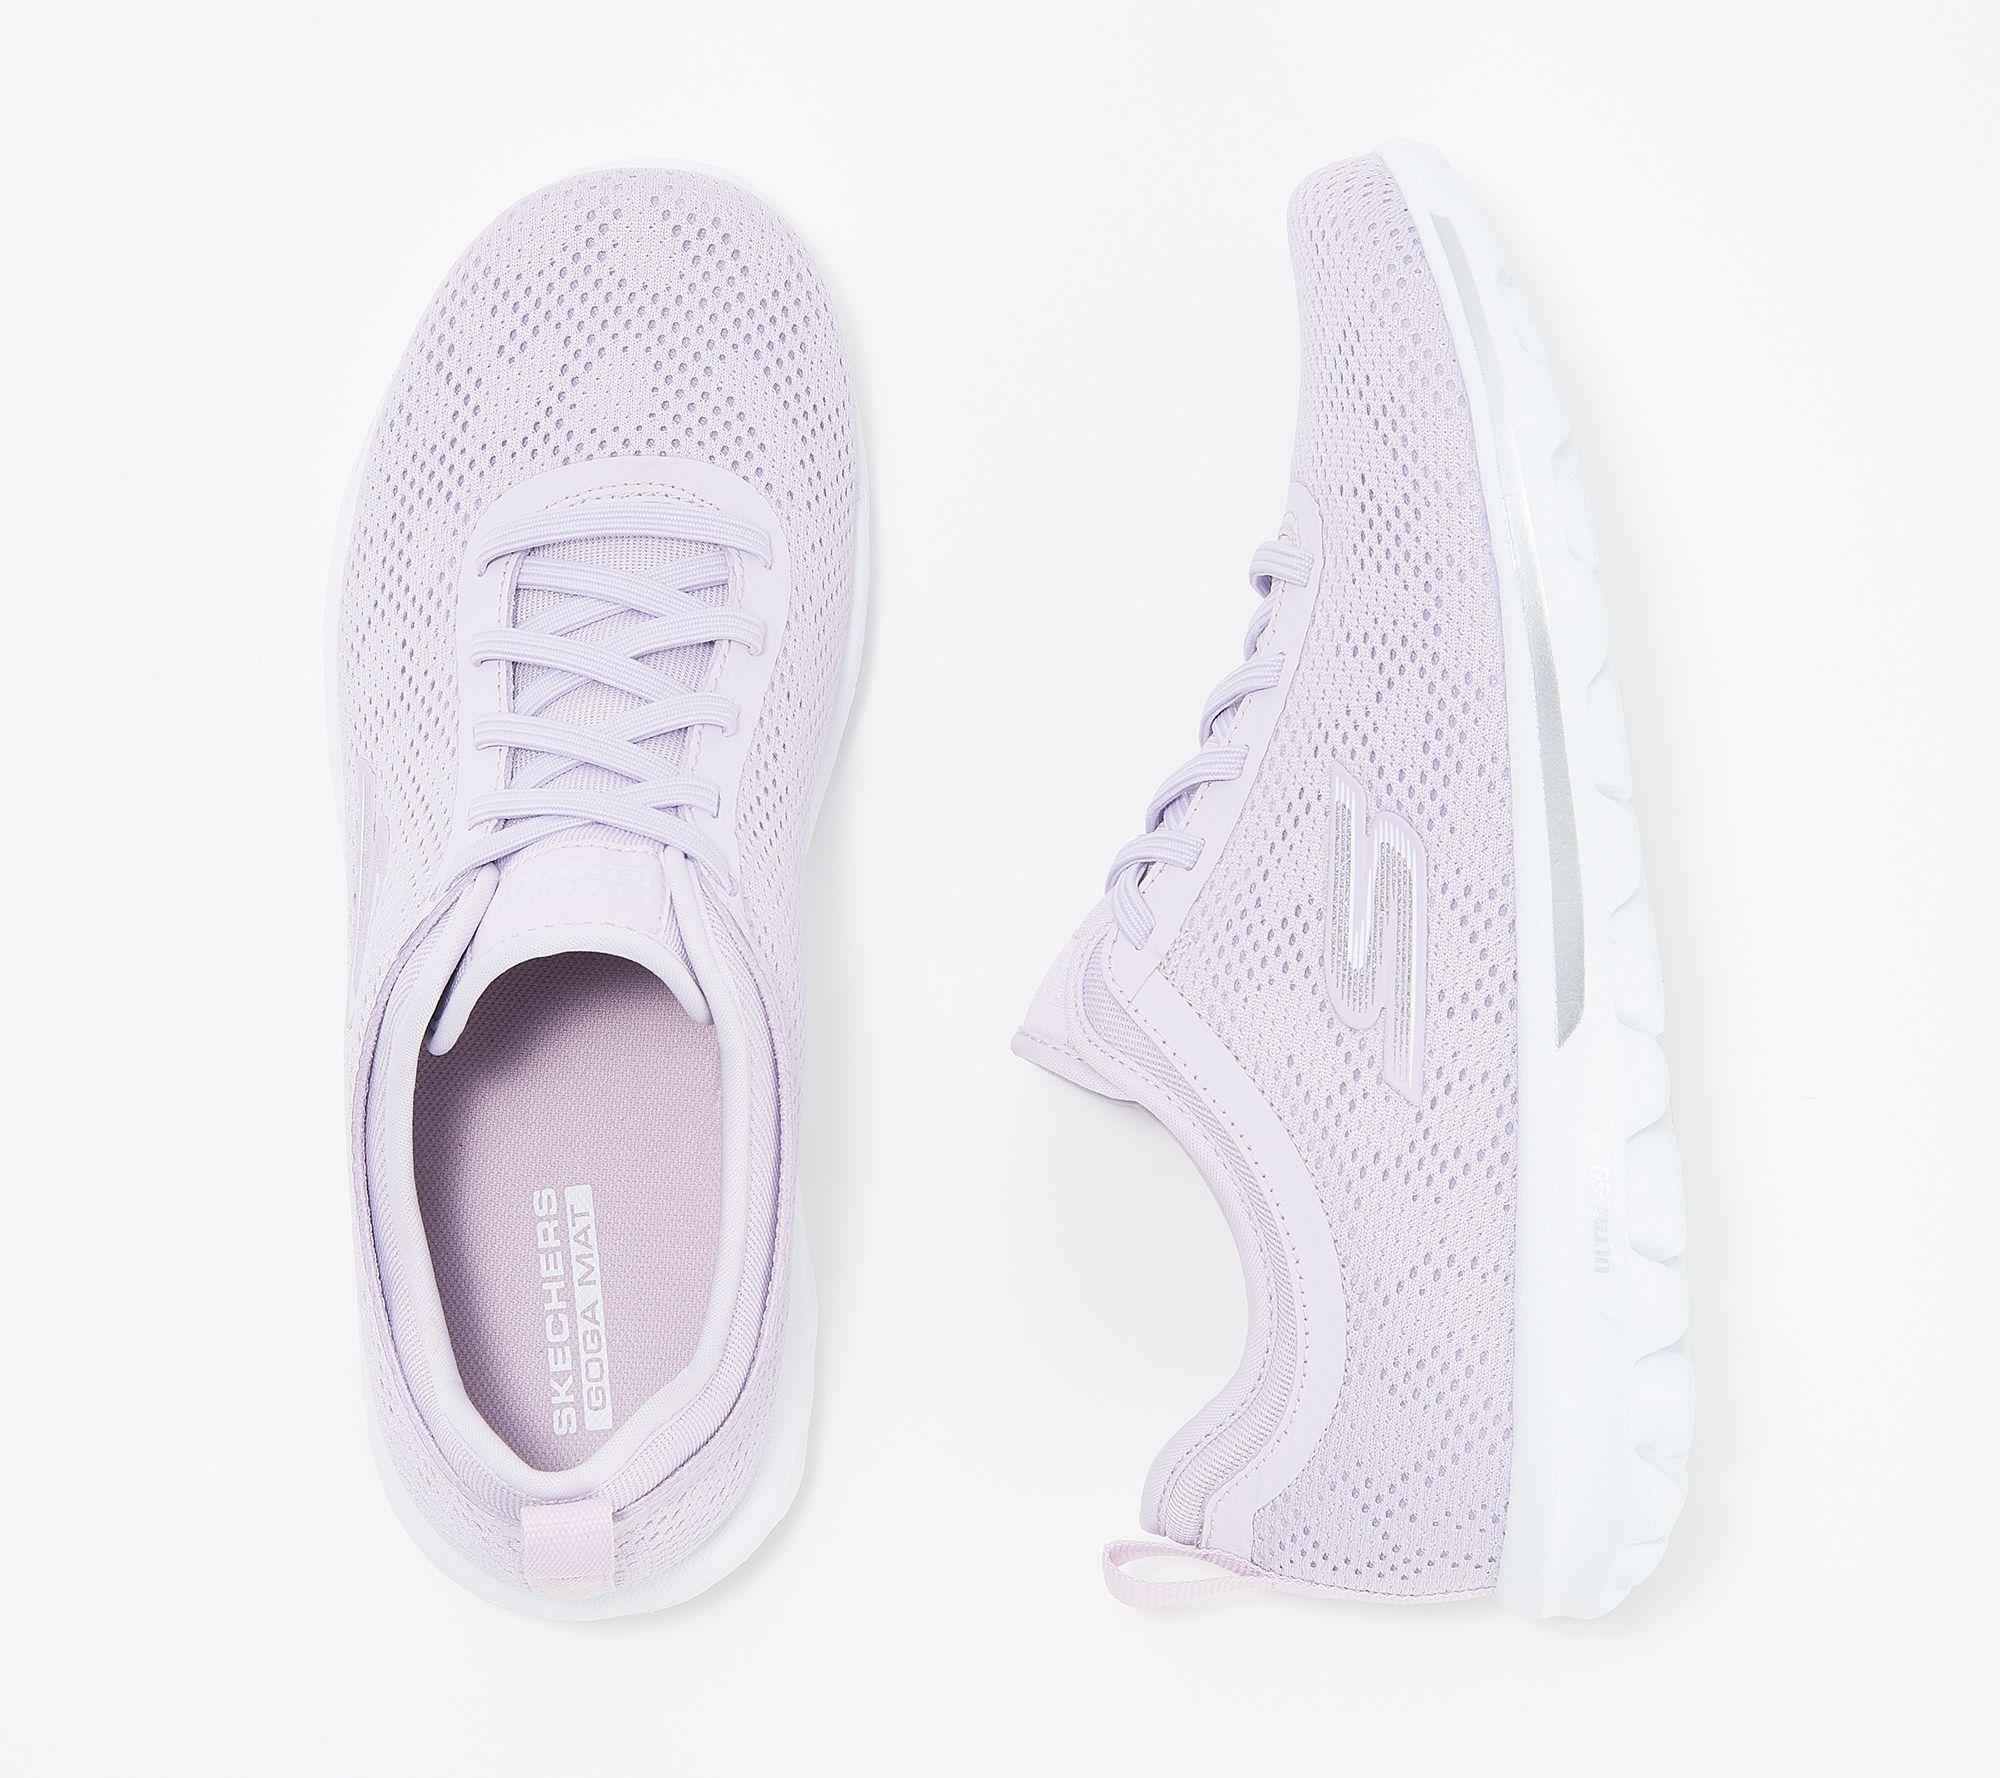 auf Lager um 50 Prozent reduziert verschiedene Stile Skechers Go Walk Gored-Lace Sneakers - Destiny — QVC.com